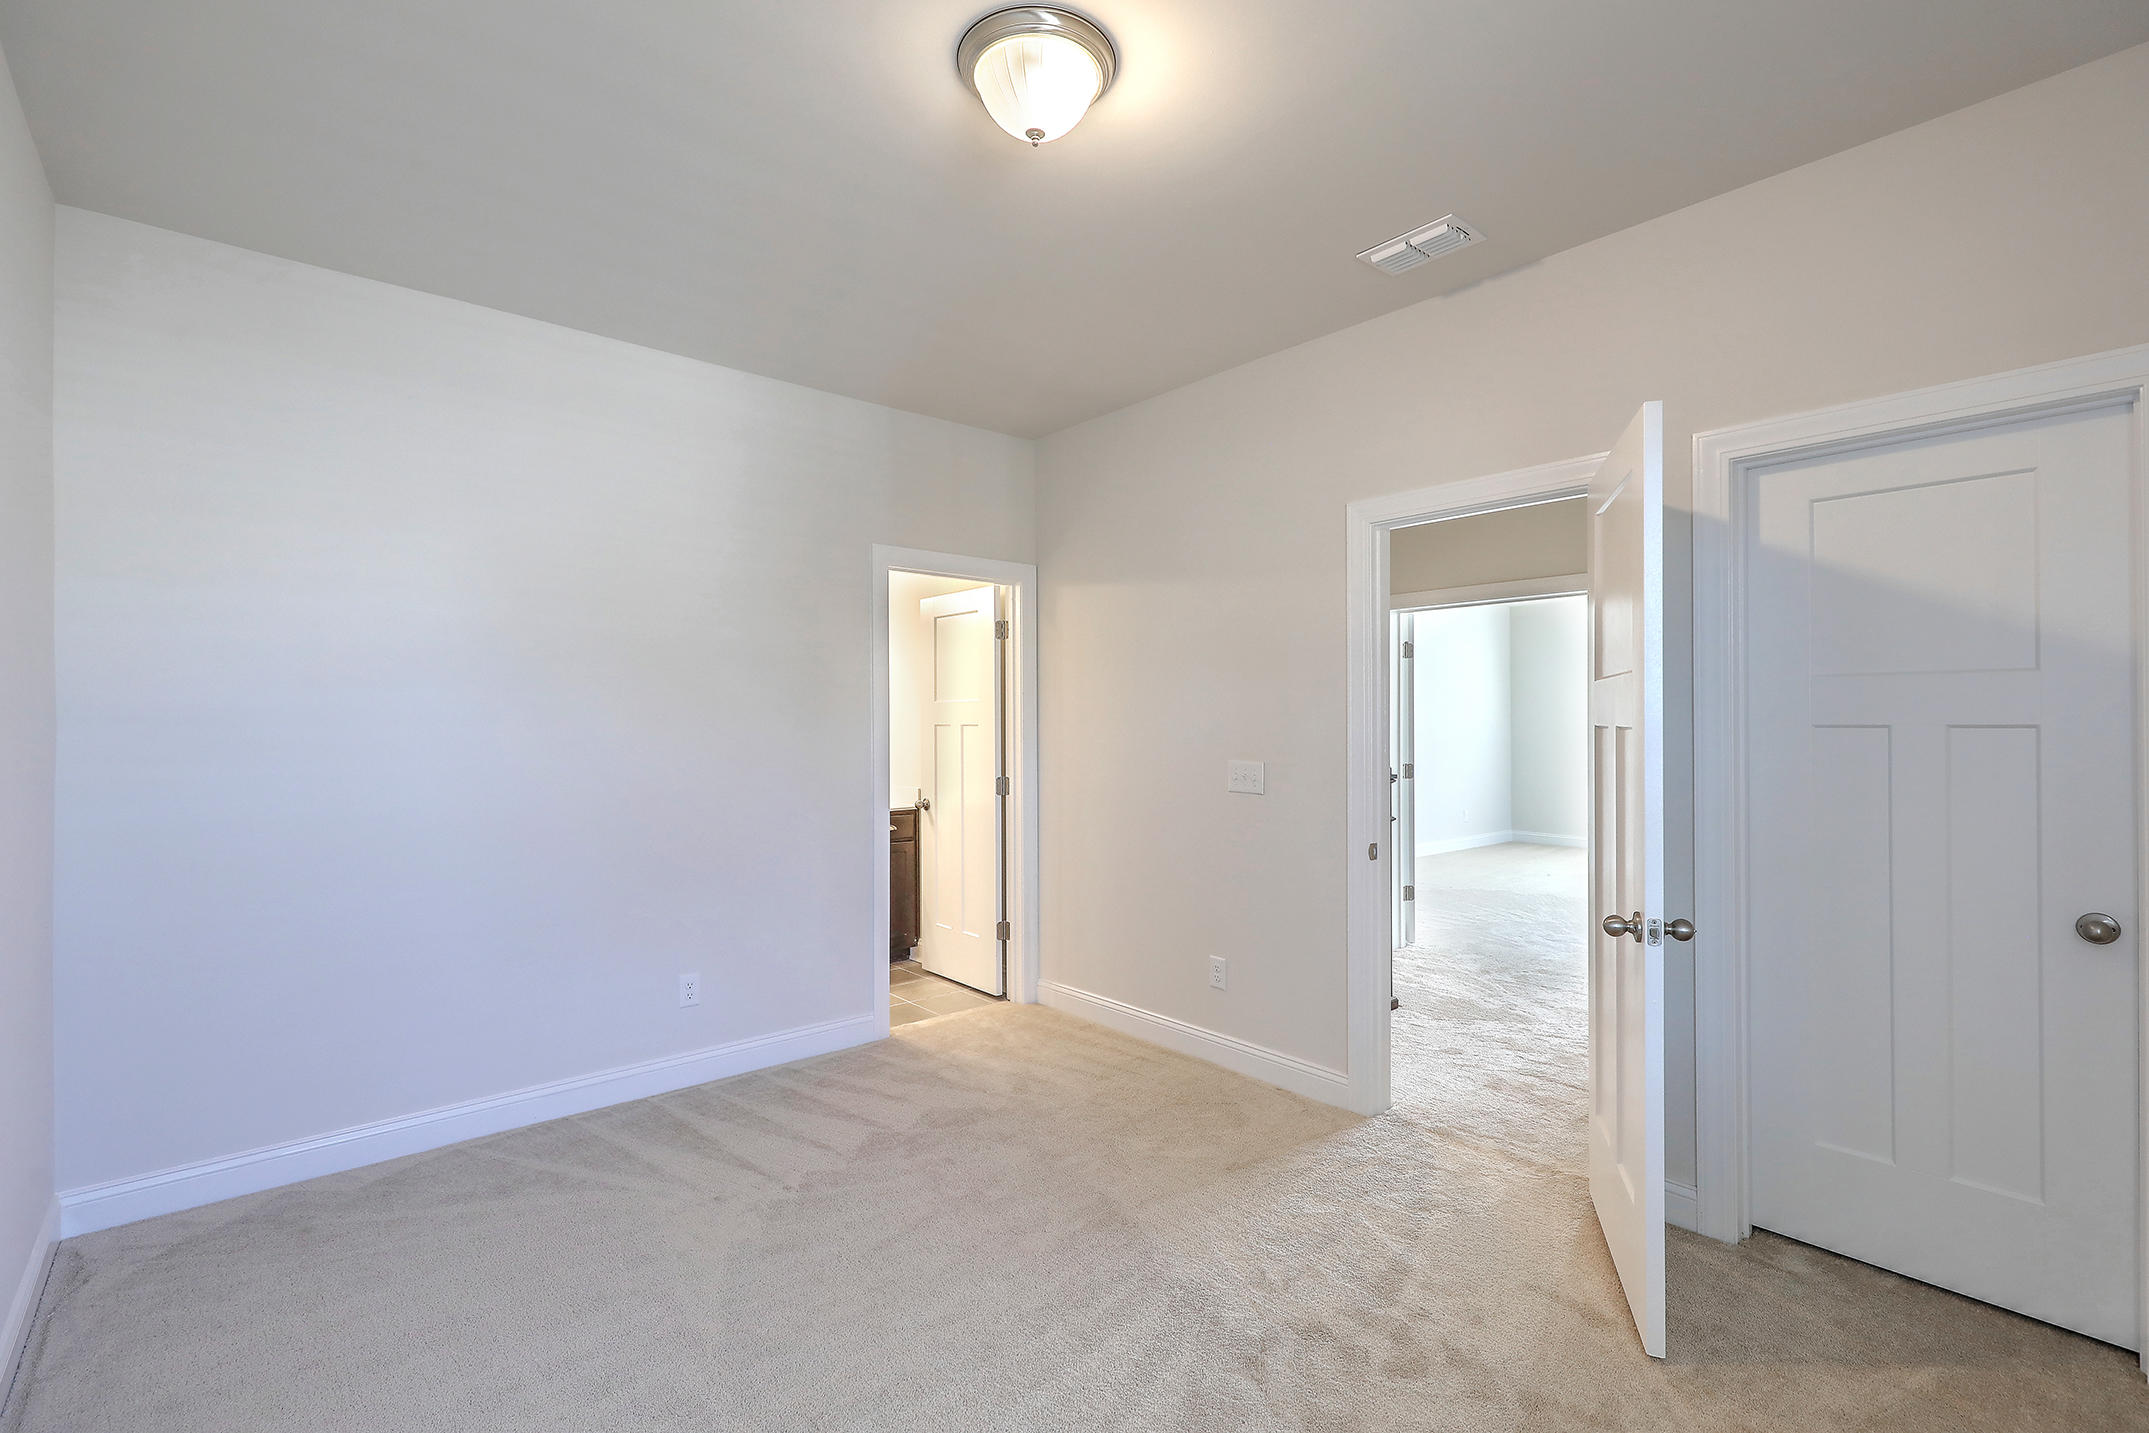 Bentley Park Homes For Sale - 1281 Gannett, Mount Pleasant, SC - 42